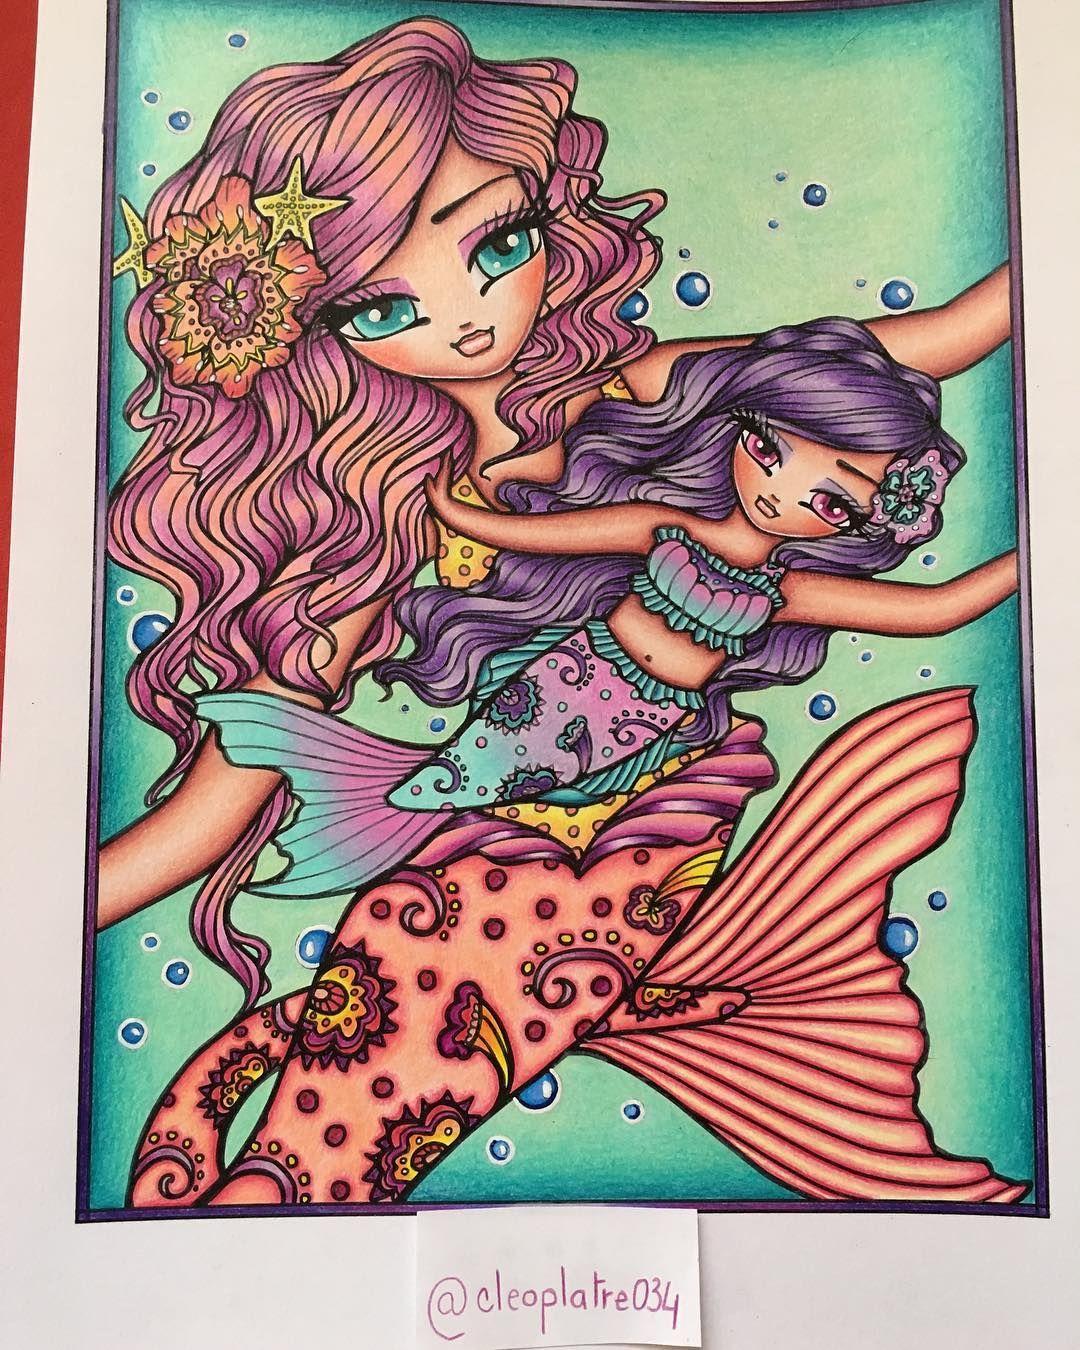 Gefallt 27 Mal 1 Kommentare Vittet Julia Cleoplatre034 Auf Instagram Completed Today Hazel Mi Mermaid Coloring Book Hannah Lynn Mermaid Accessories [ 1350 x 1080 Pixel ]